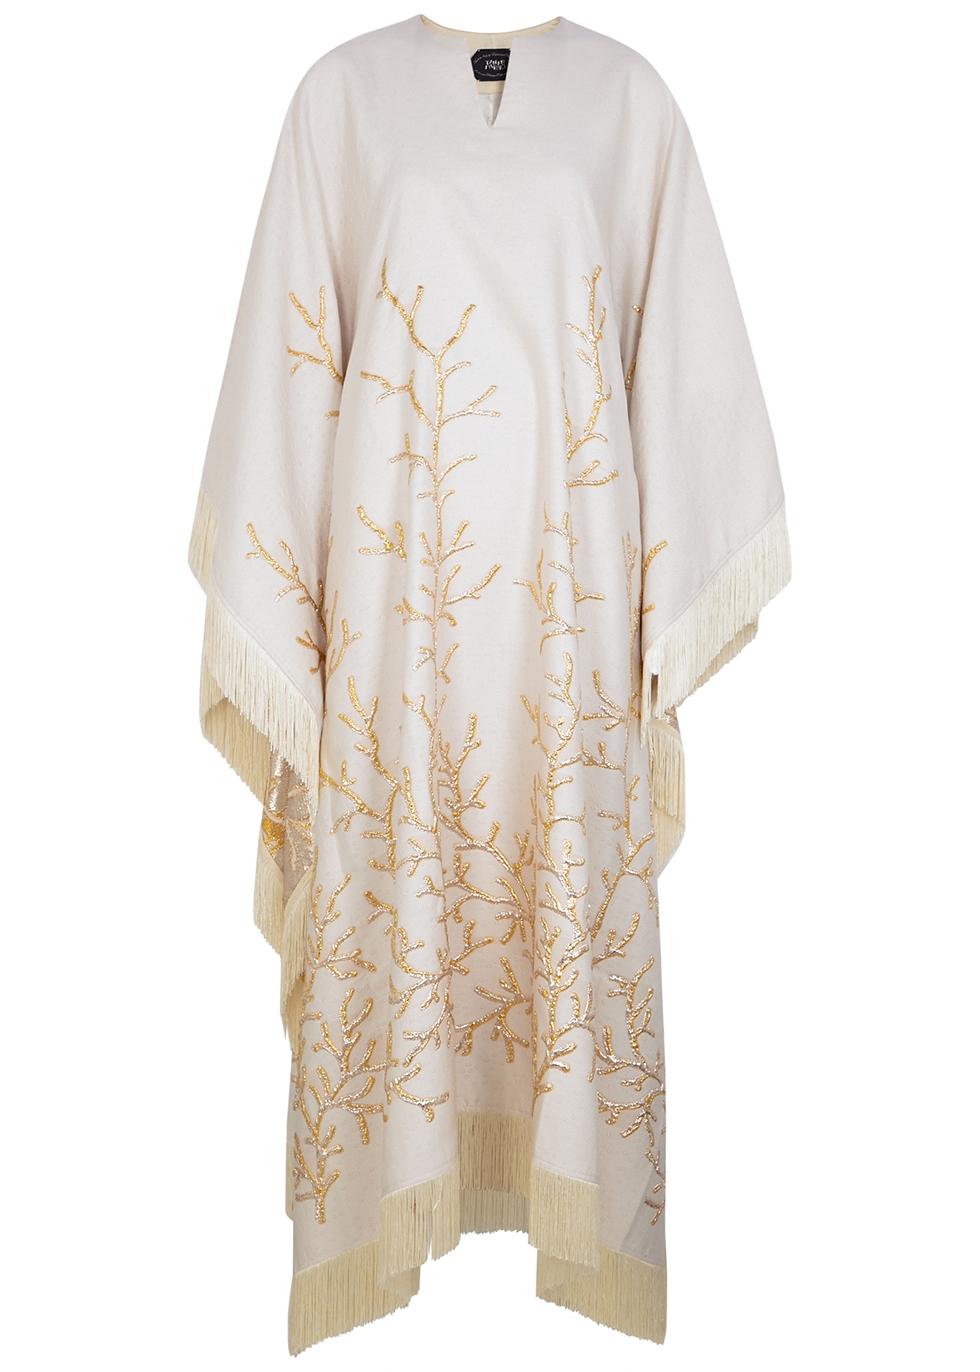 Los Corales fringe-trimmed jacquard gown